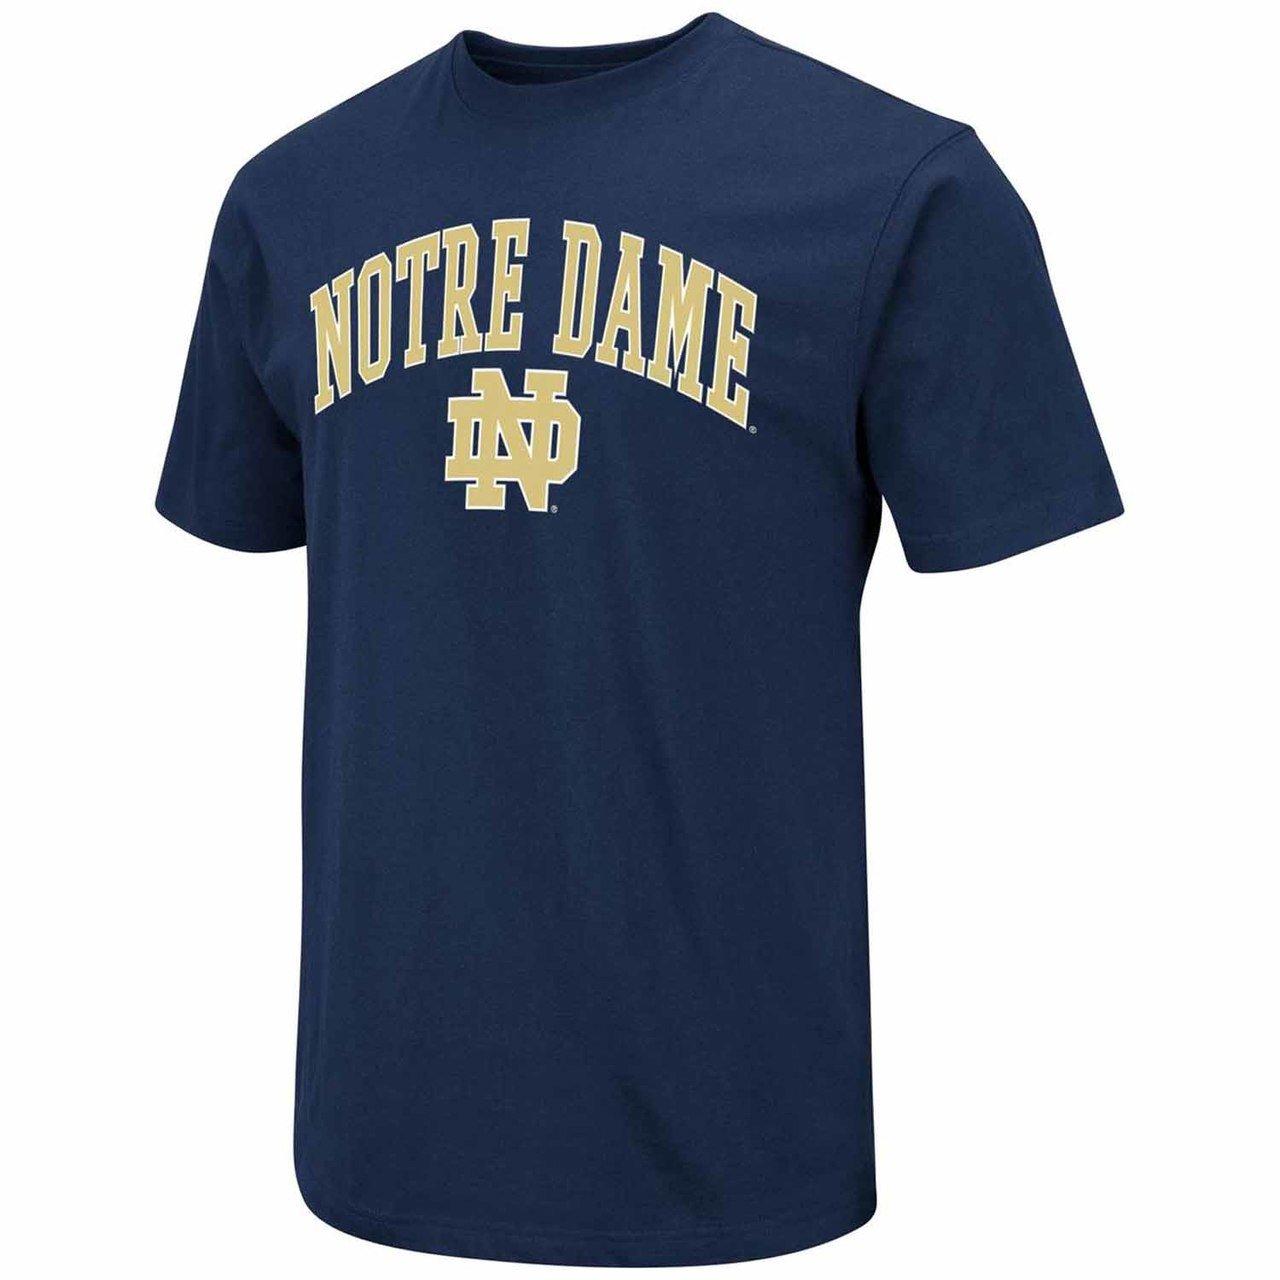 67dd3b2c0 Blue Notre Dame T Shirt - Querciacb